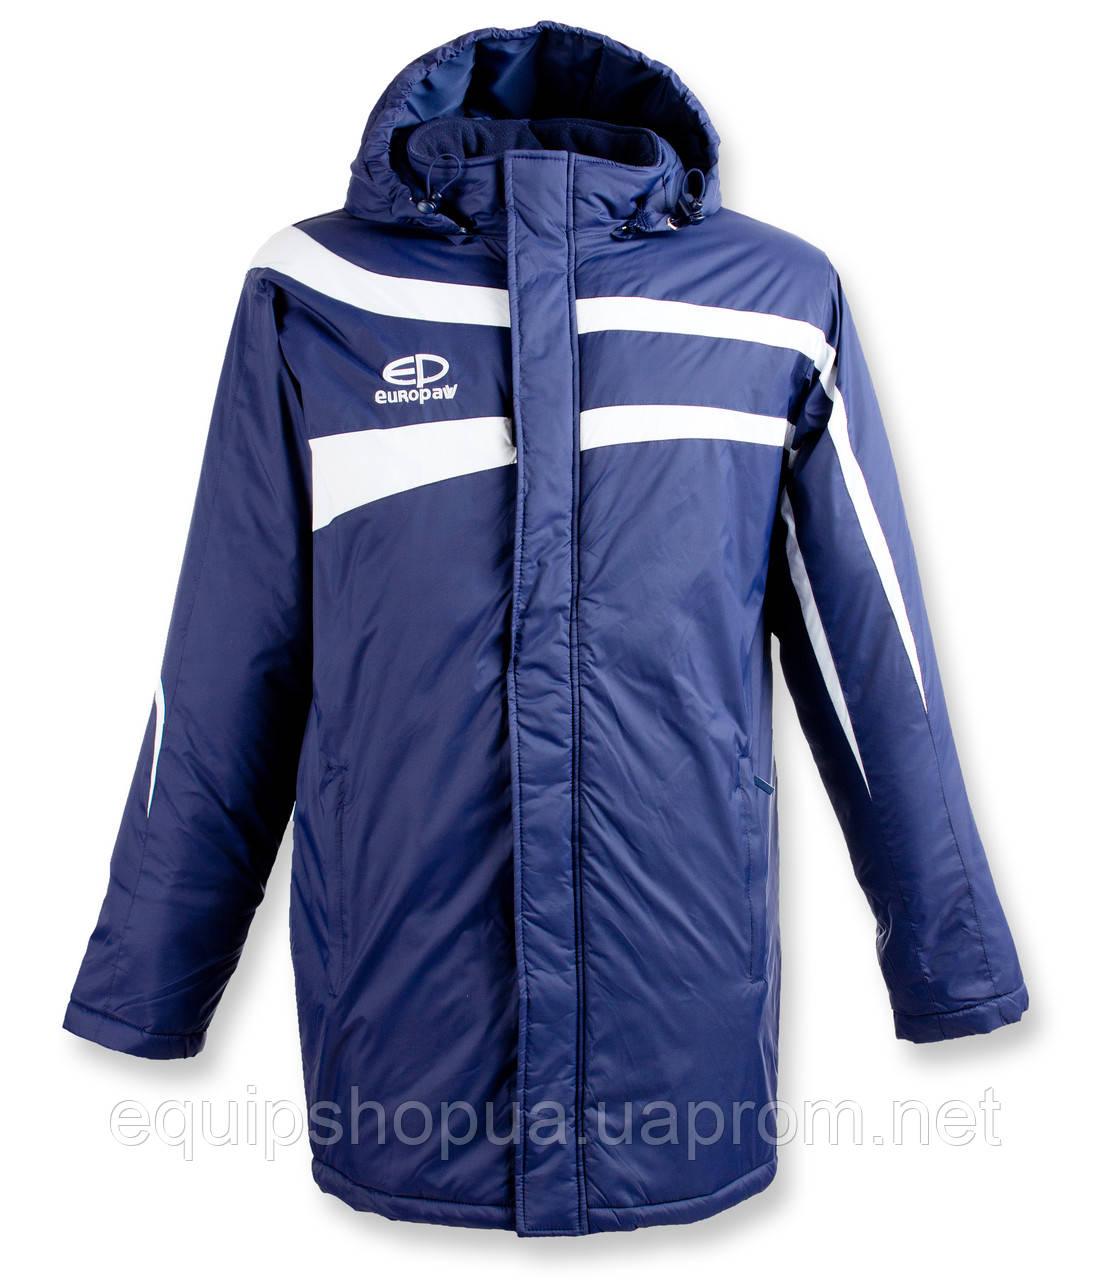 Куртка Зимняя (удлиненная) Europaw TeamLine темно-синяя